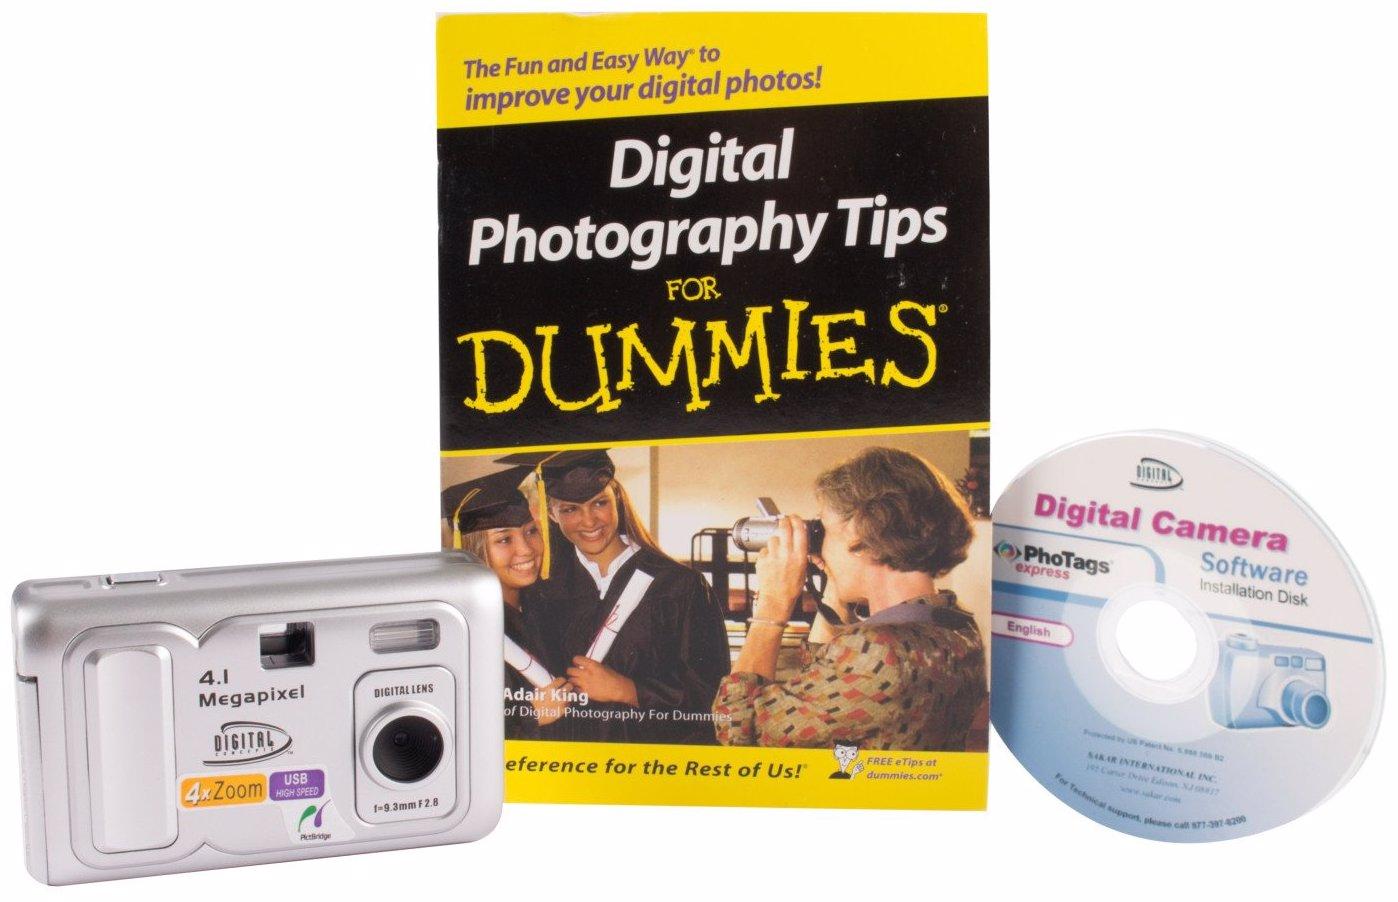 vivitar digital camera software download